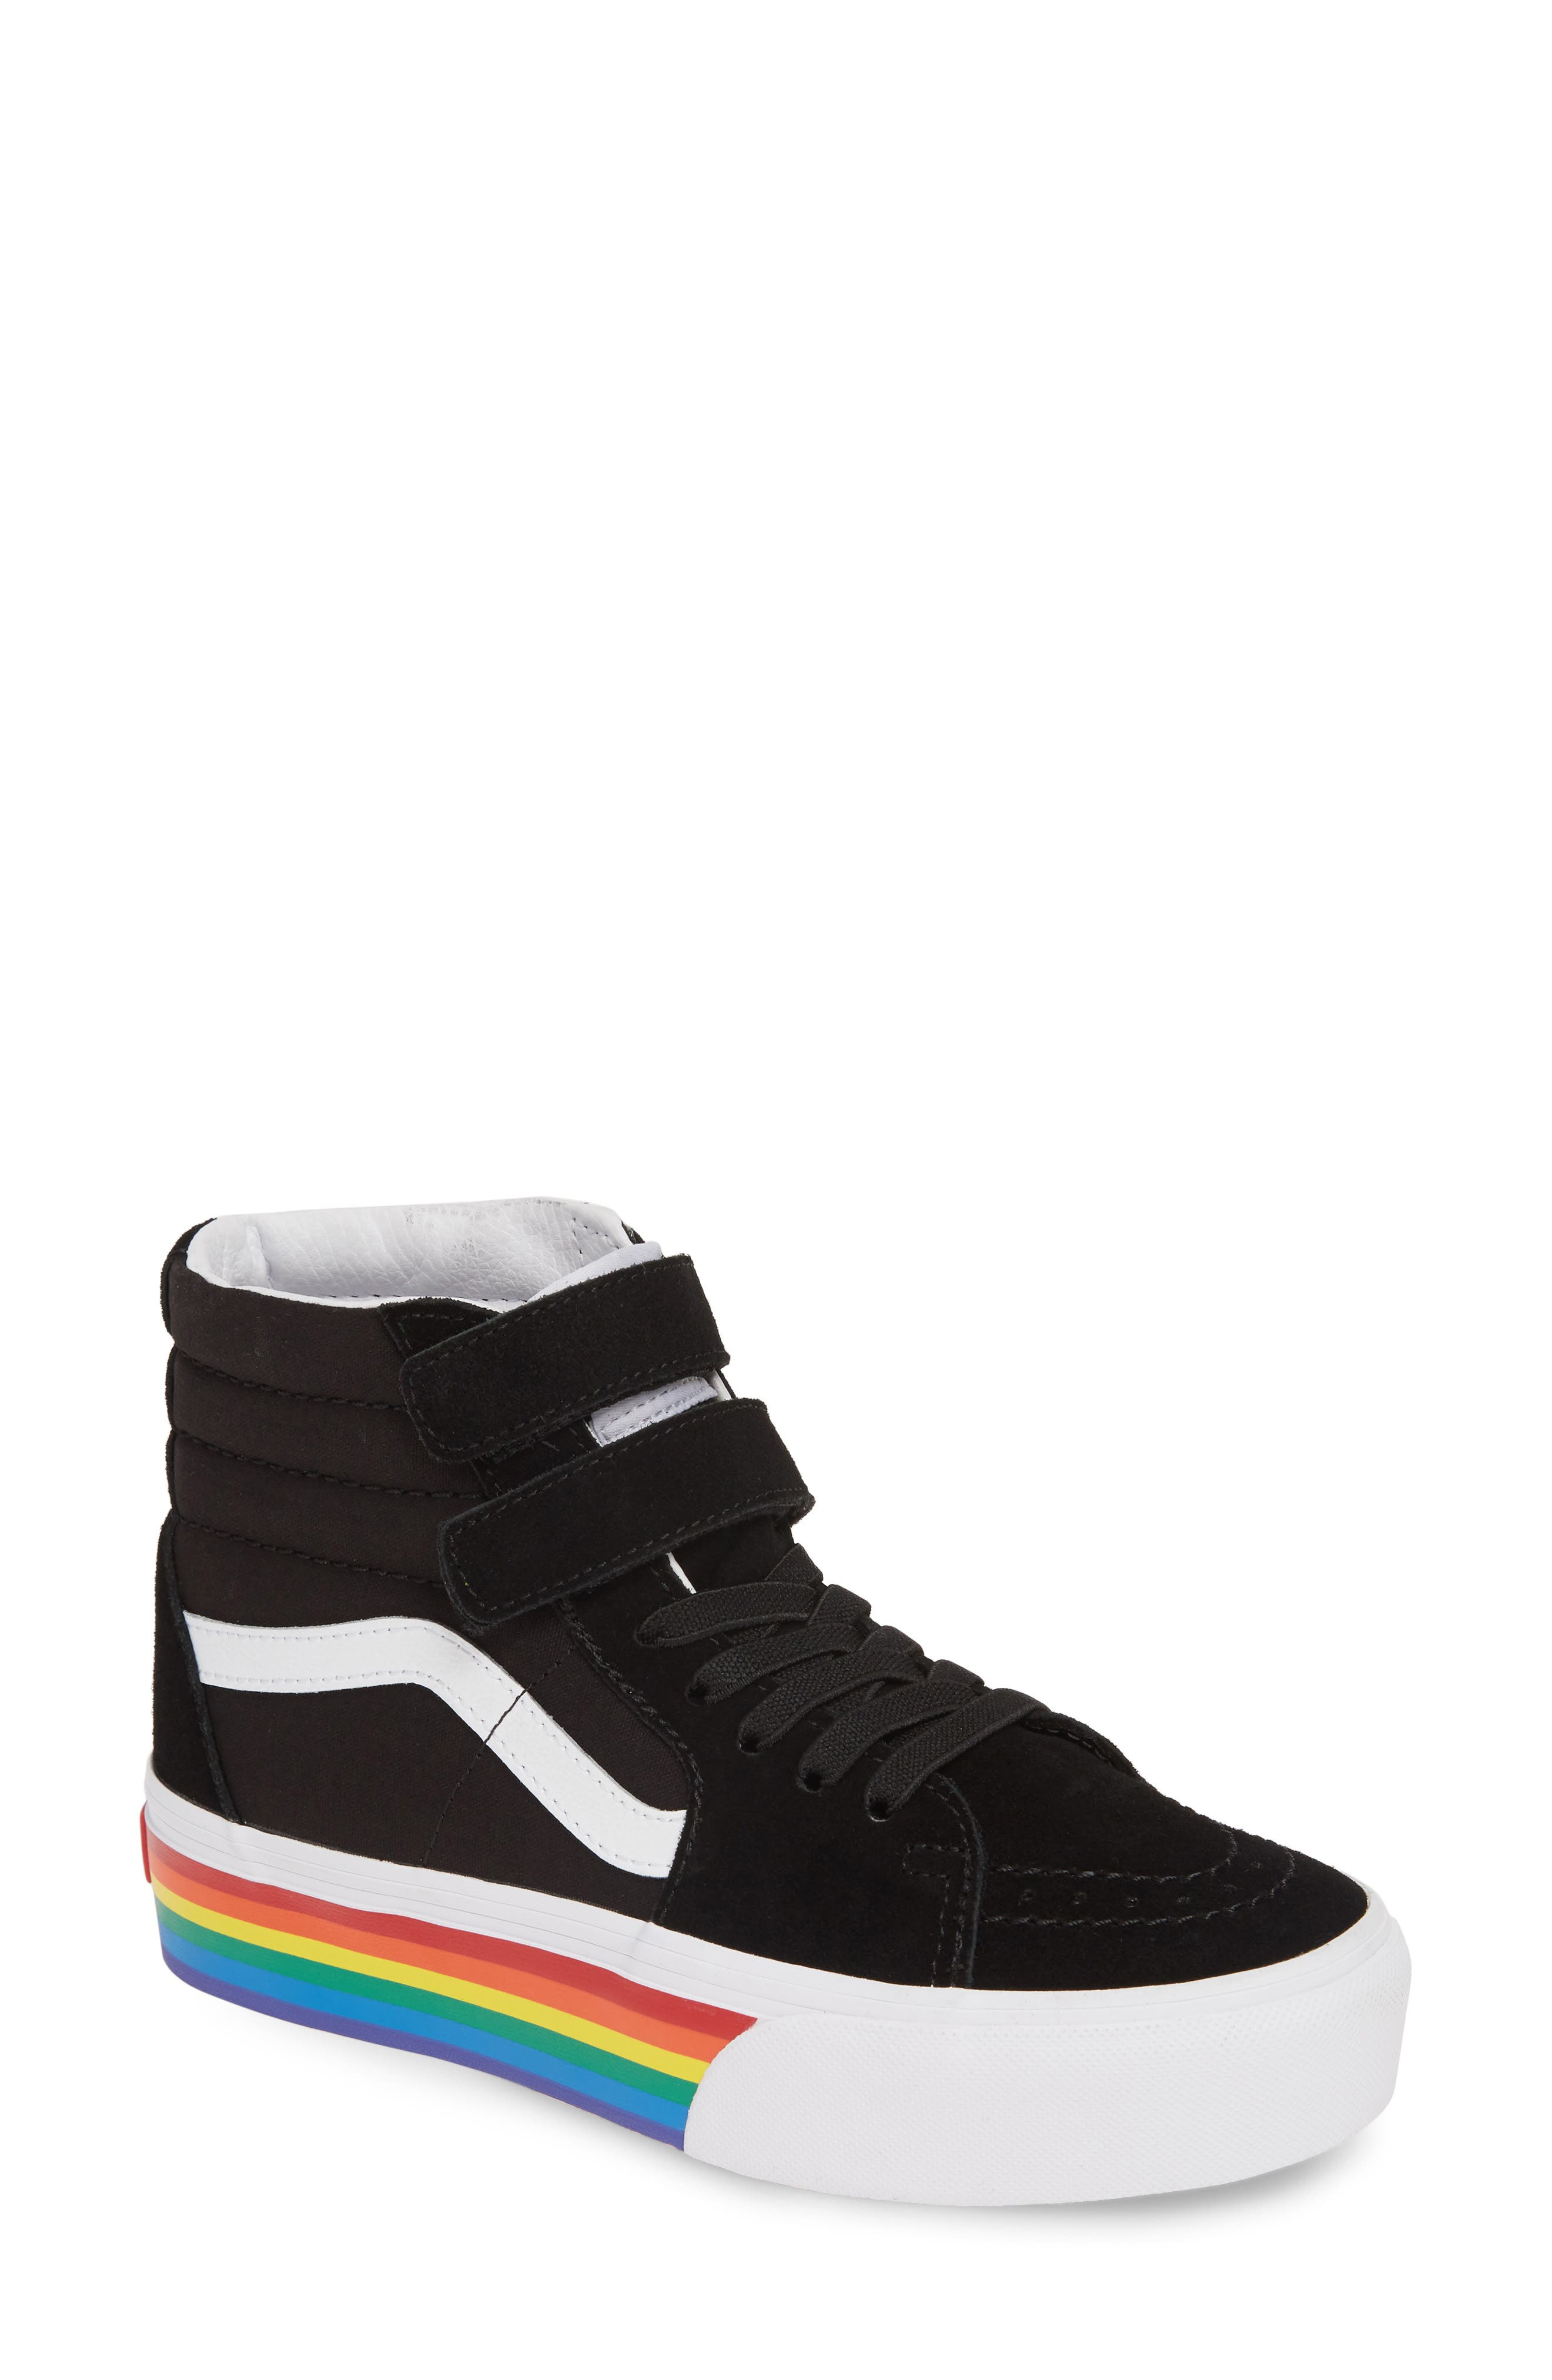 Sk8-Hi V Rainbow Platform Sneaker, Main, color, RAINBOW BLACK/ TRUE WHITE